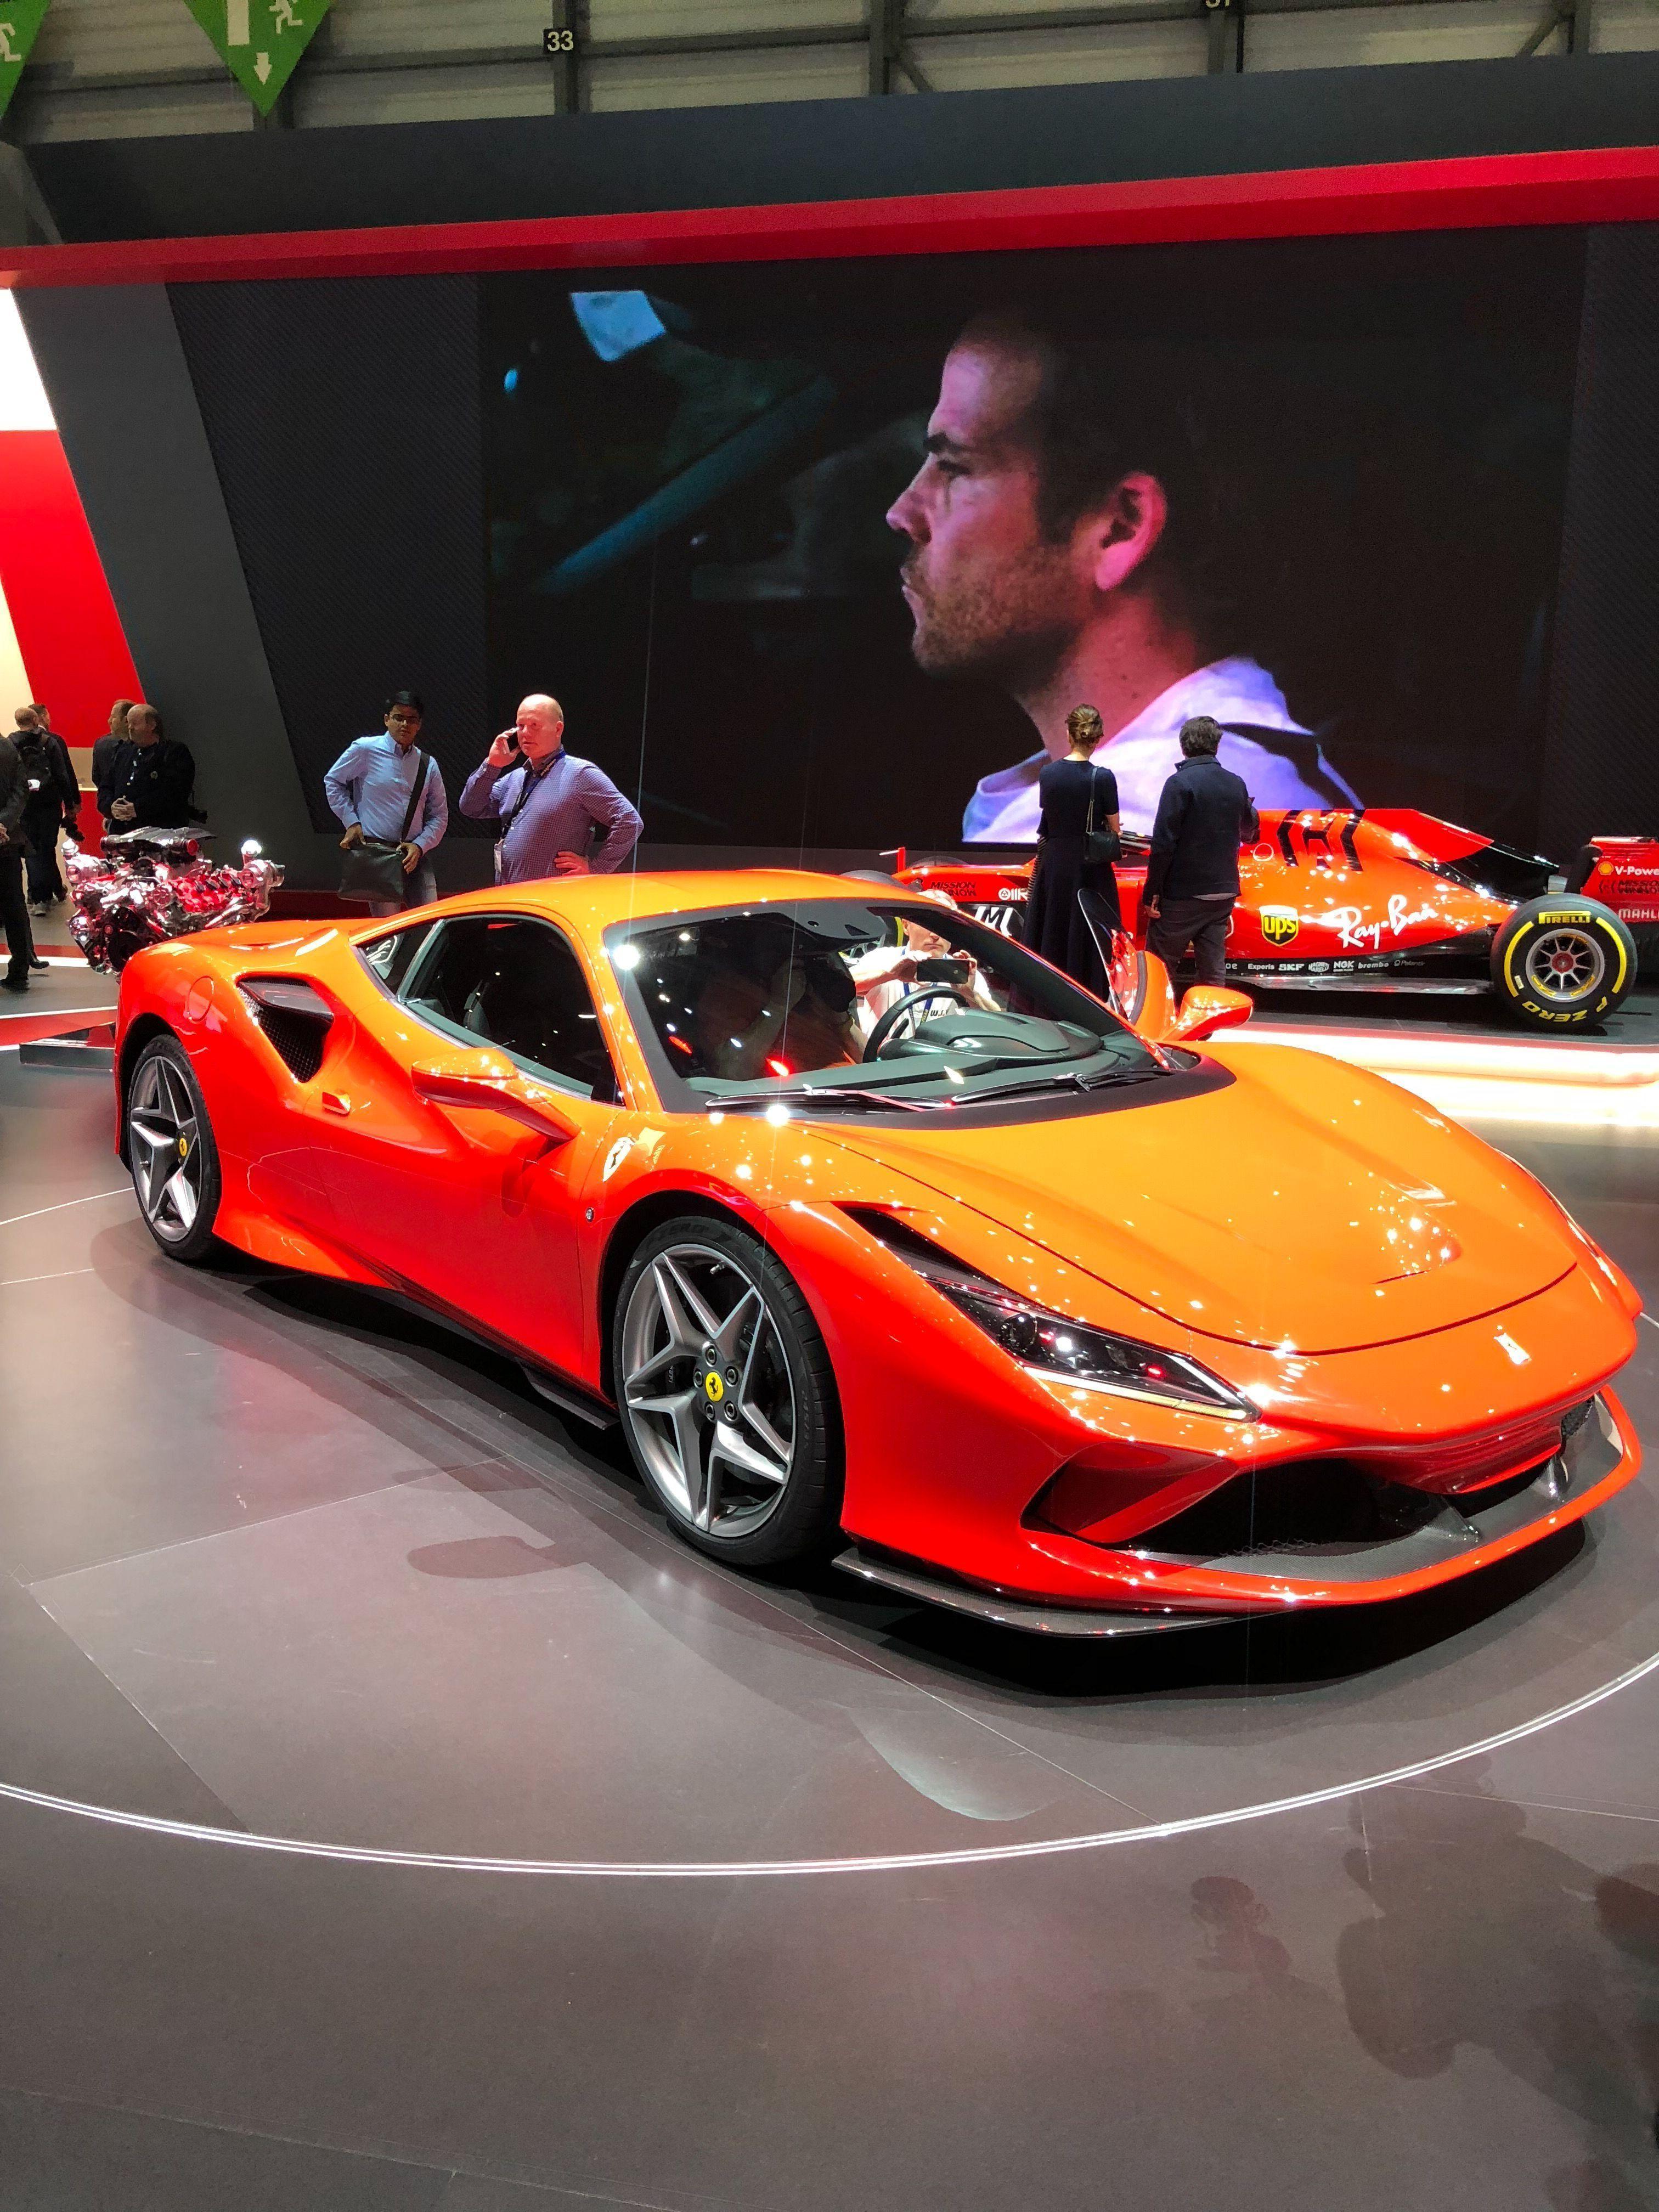 2020 Ferrari F8 Tributo Reviews Newferrari 2020 Ferrari F8